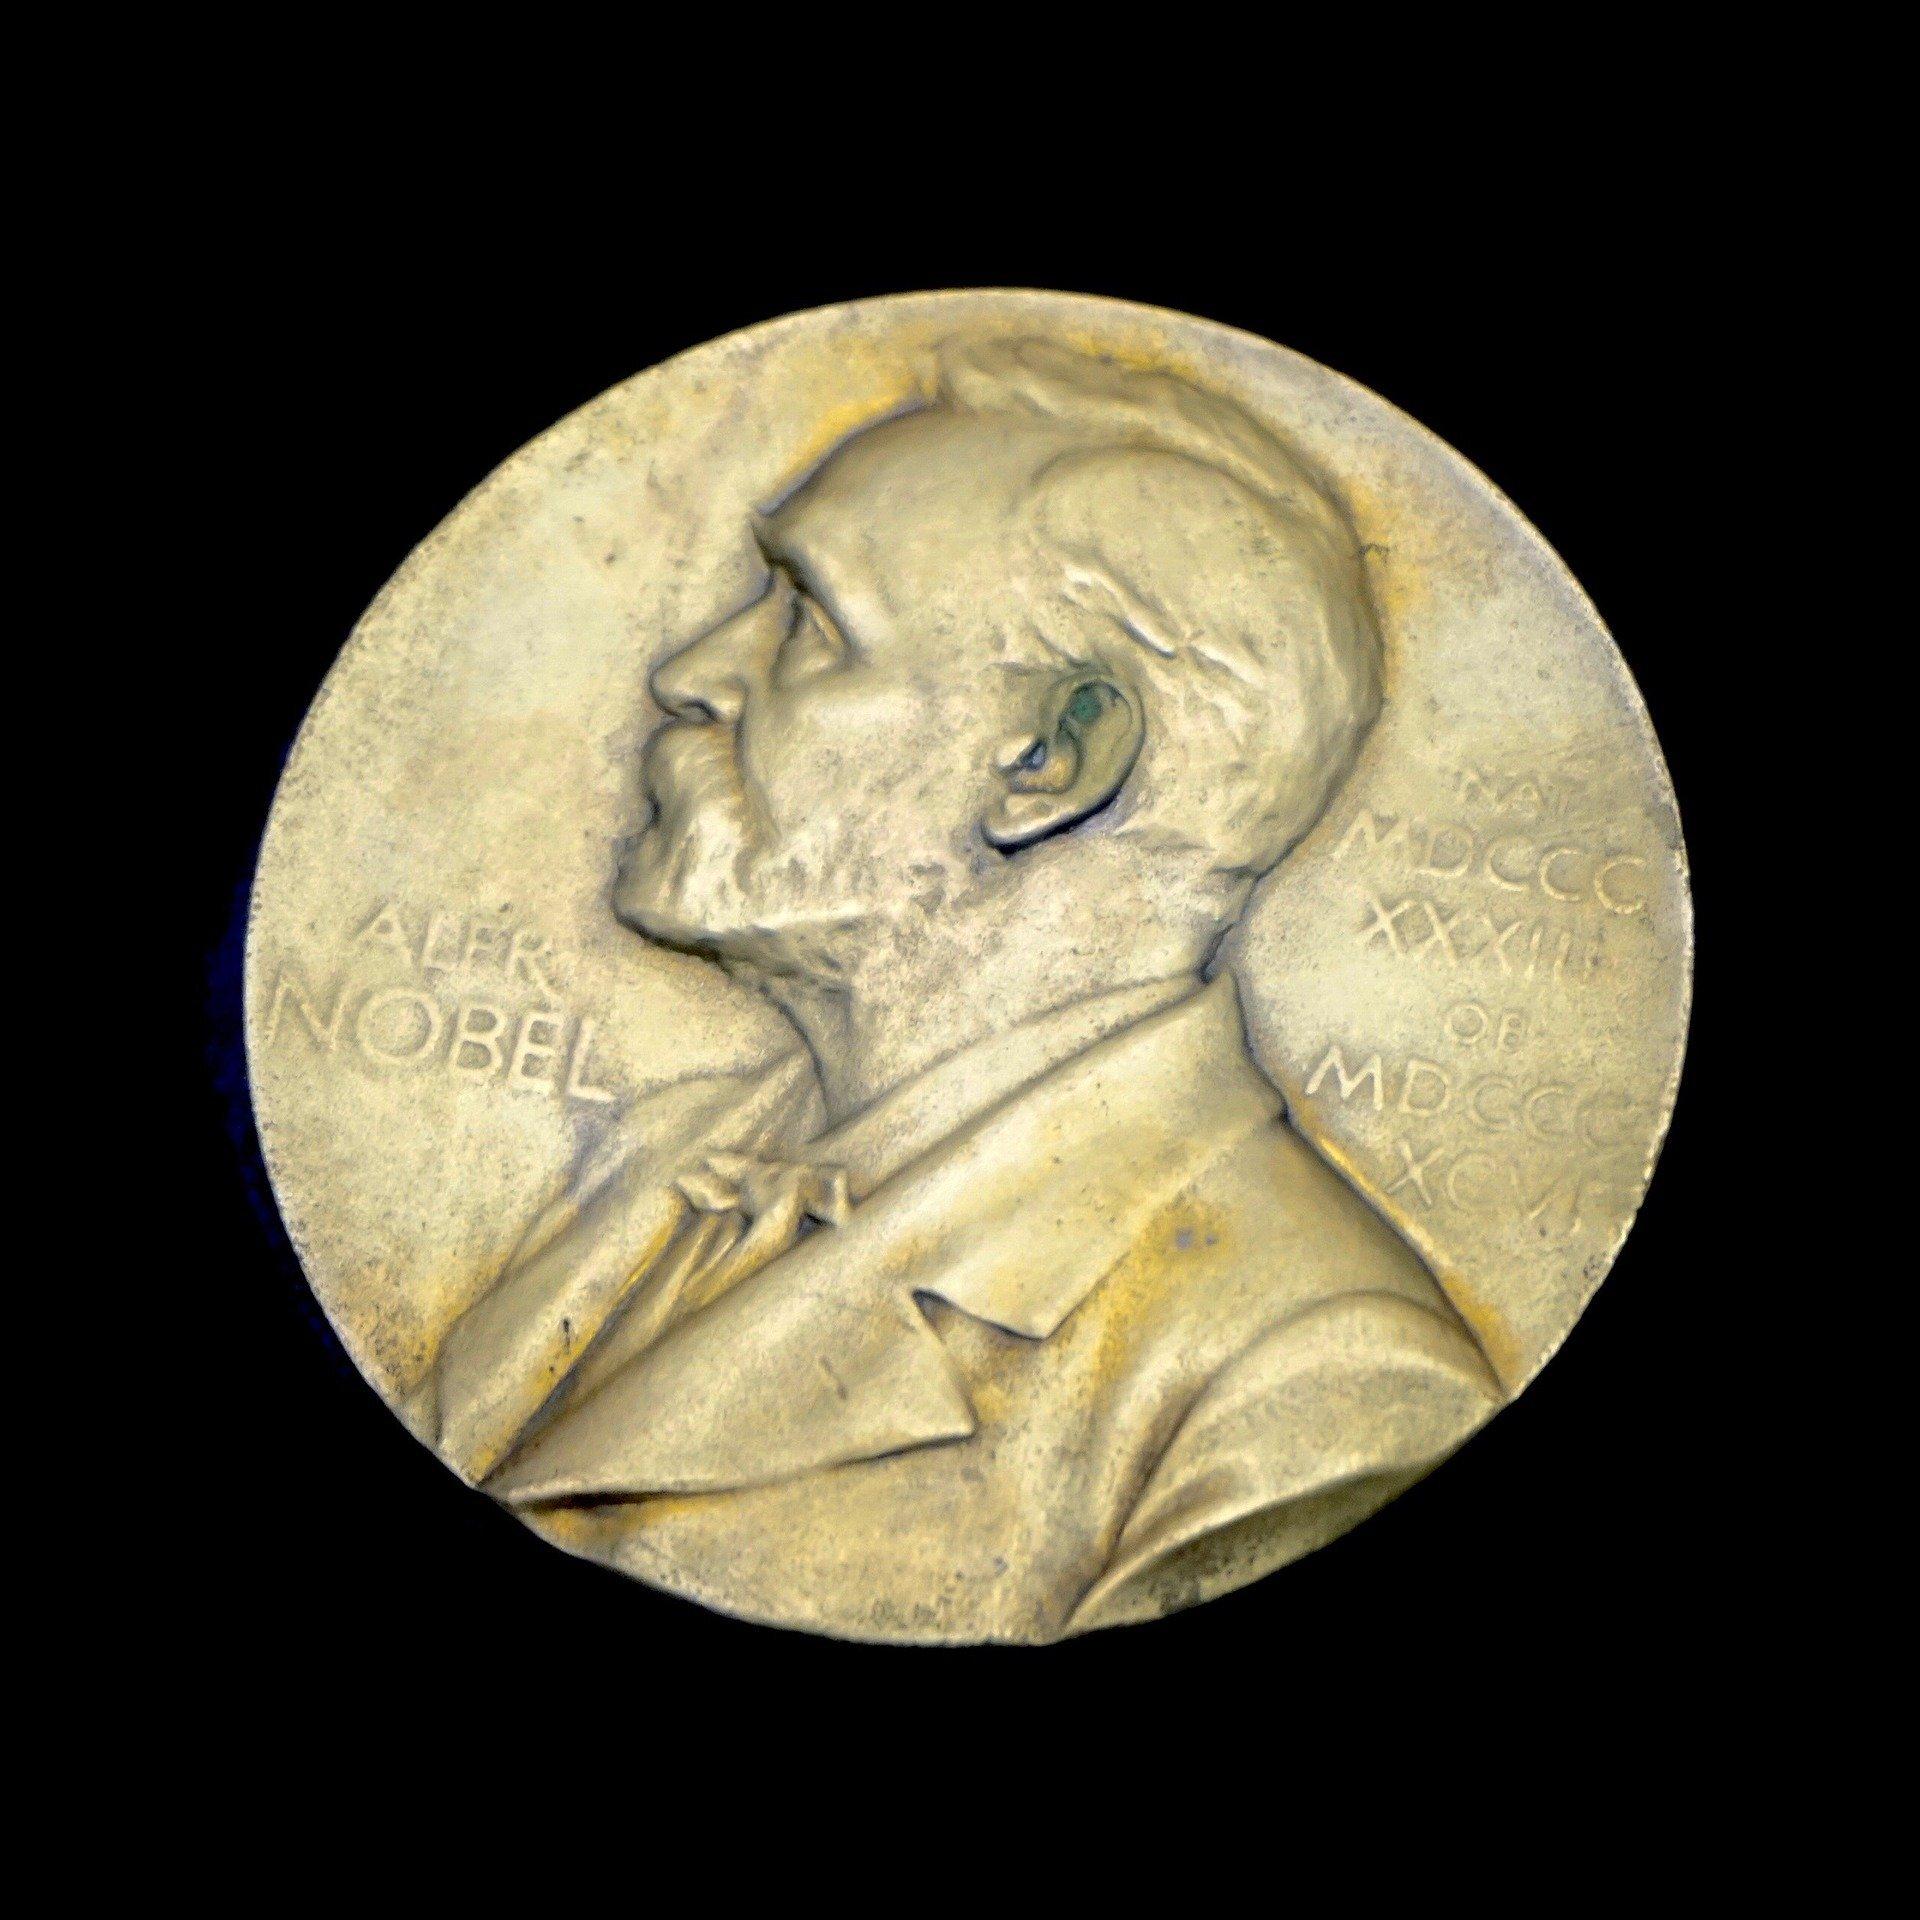 Nobel prizewinners have different career patterns than peers